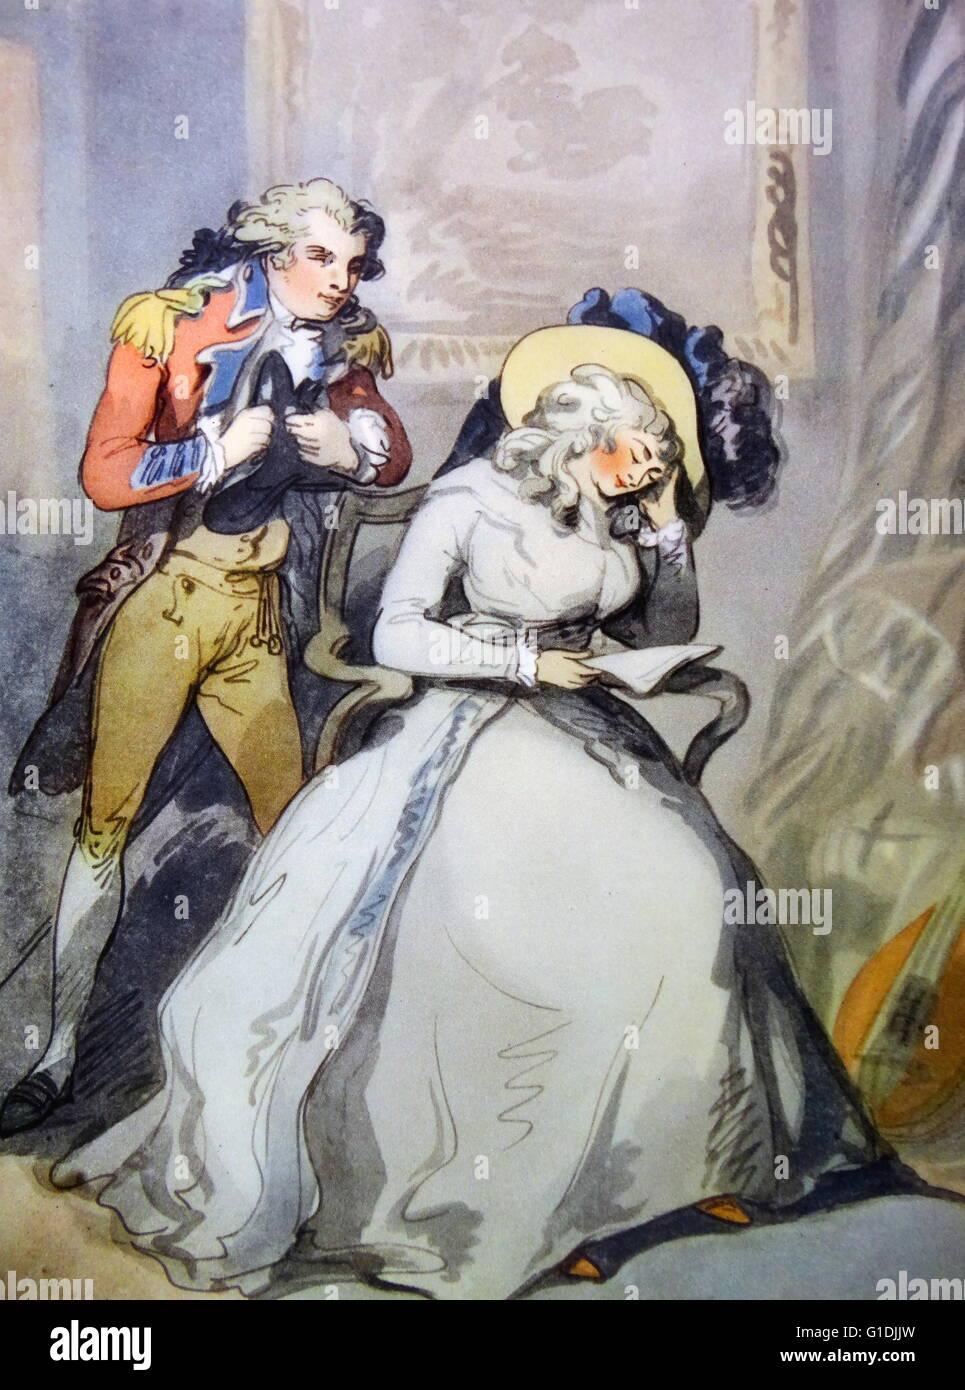 Tom Jones and Sophia Western by Thomas Rowlandson. - Stock Image